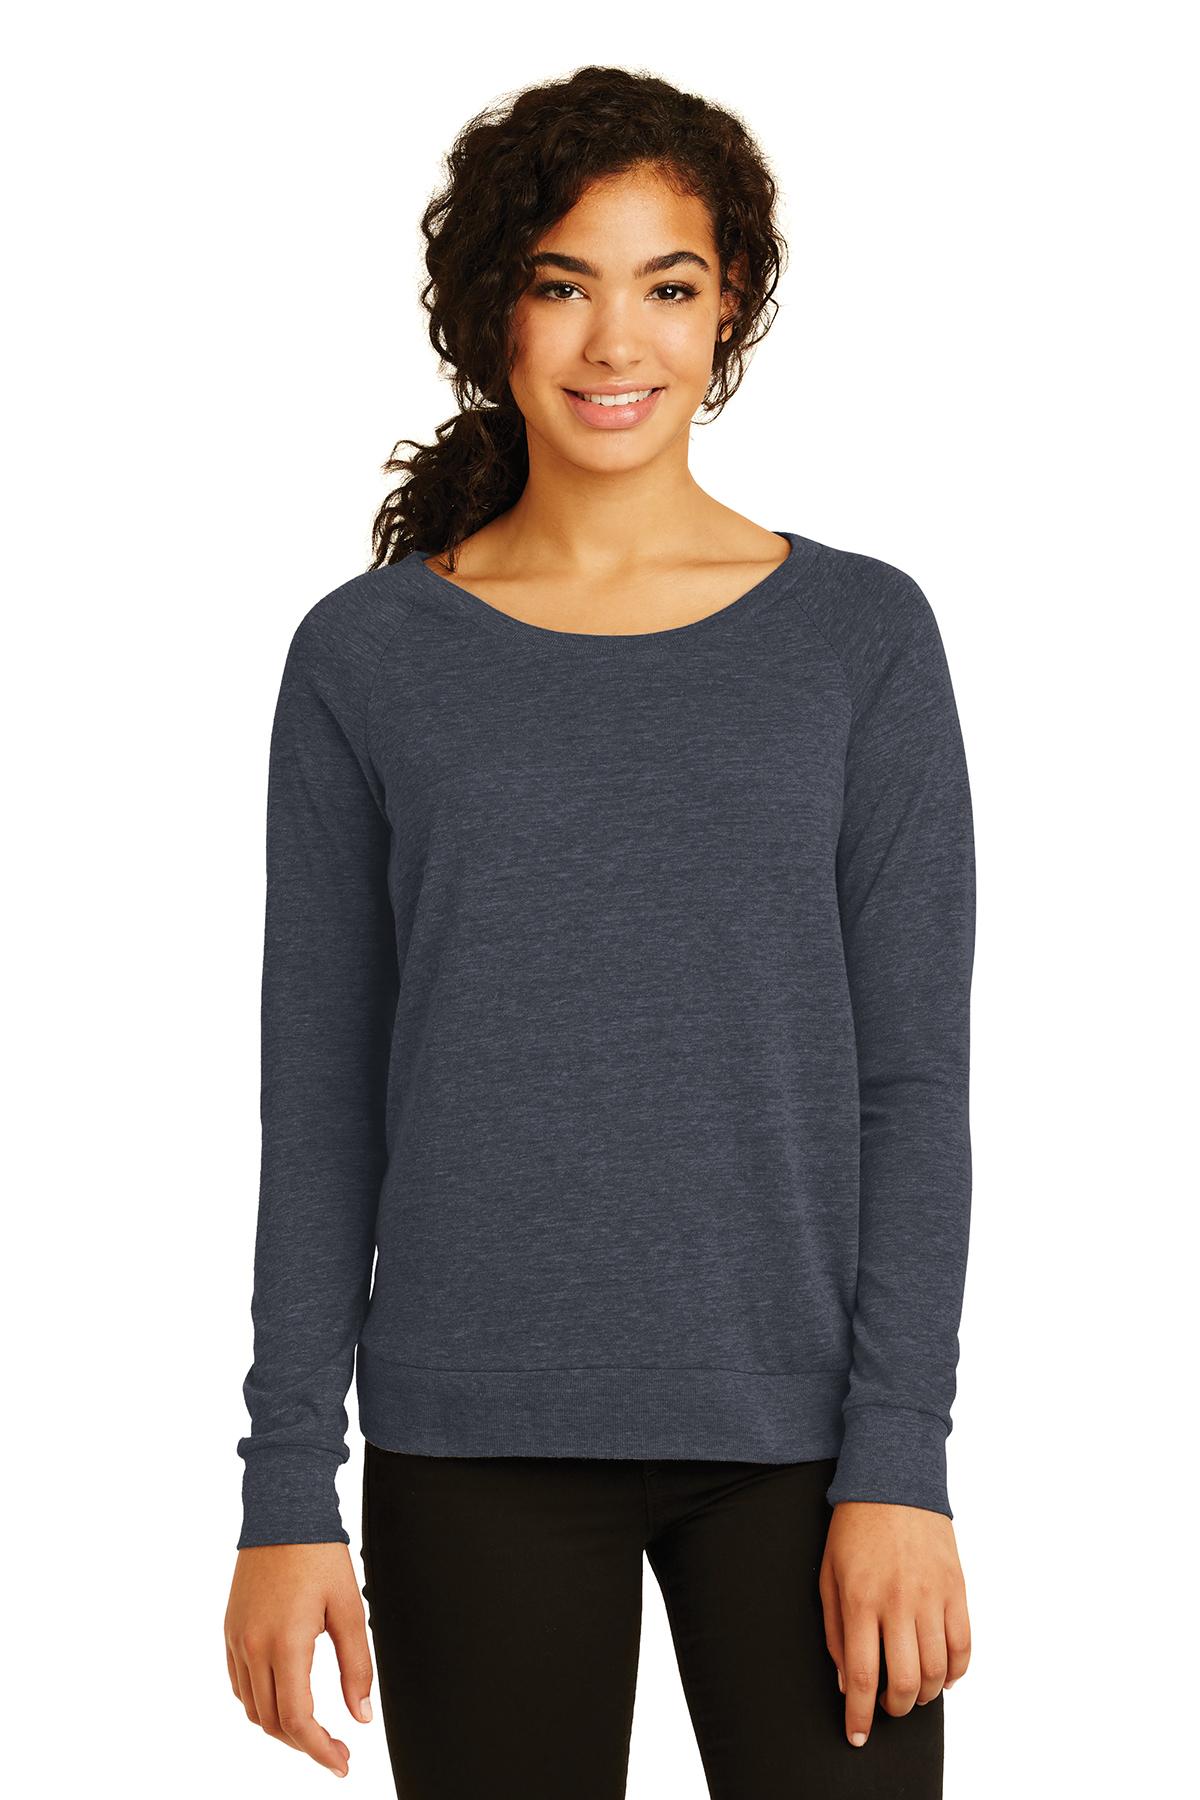 83c165274af Alternative Women's Eco-Jersey™ Slouchy Pullover | Alternative ...